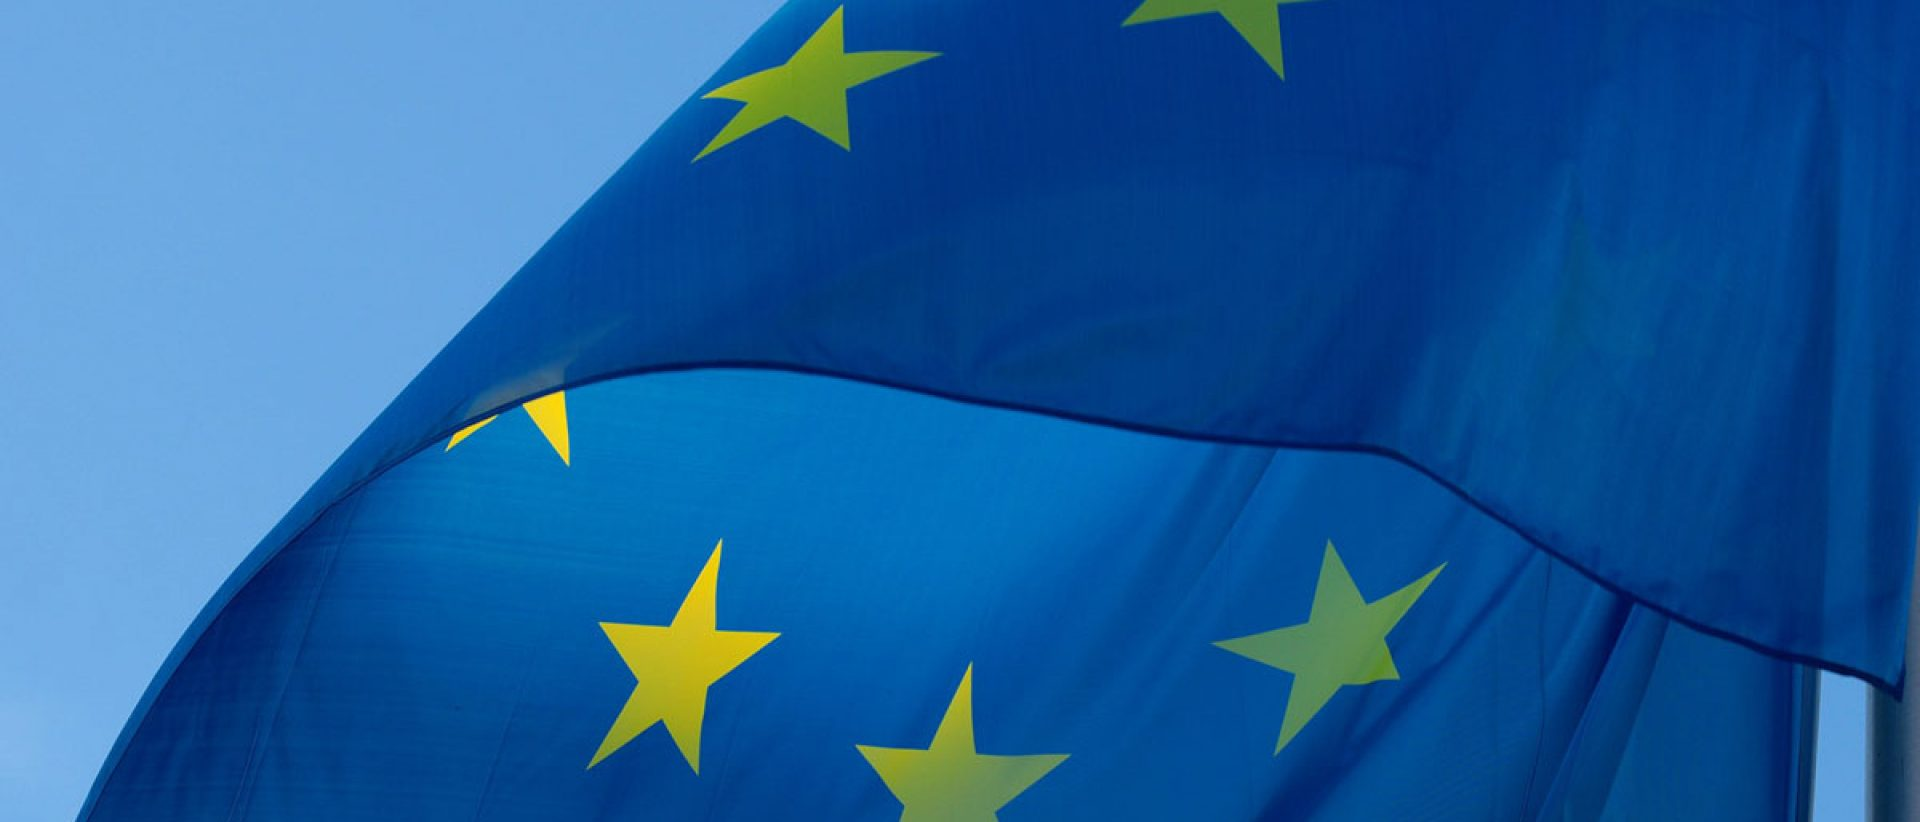 2019-05-27-eu-flagge